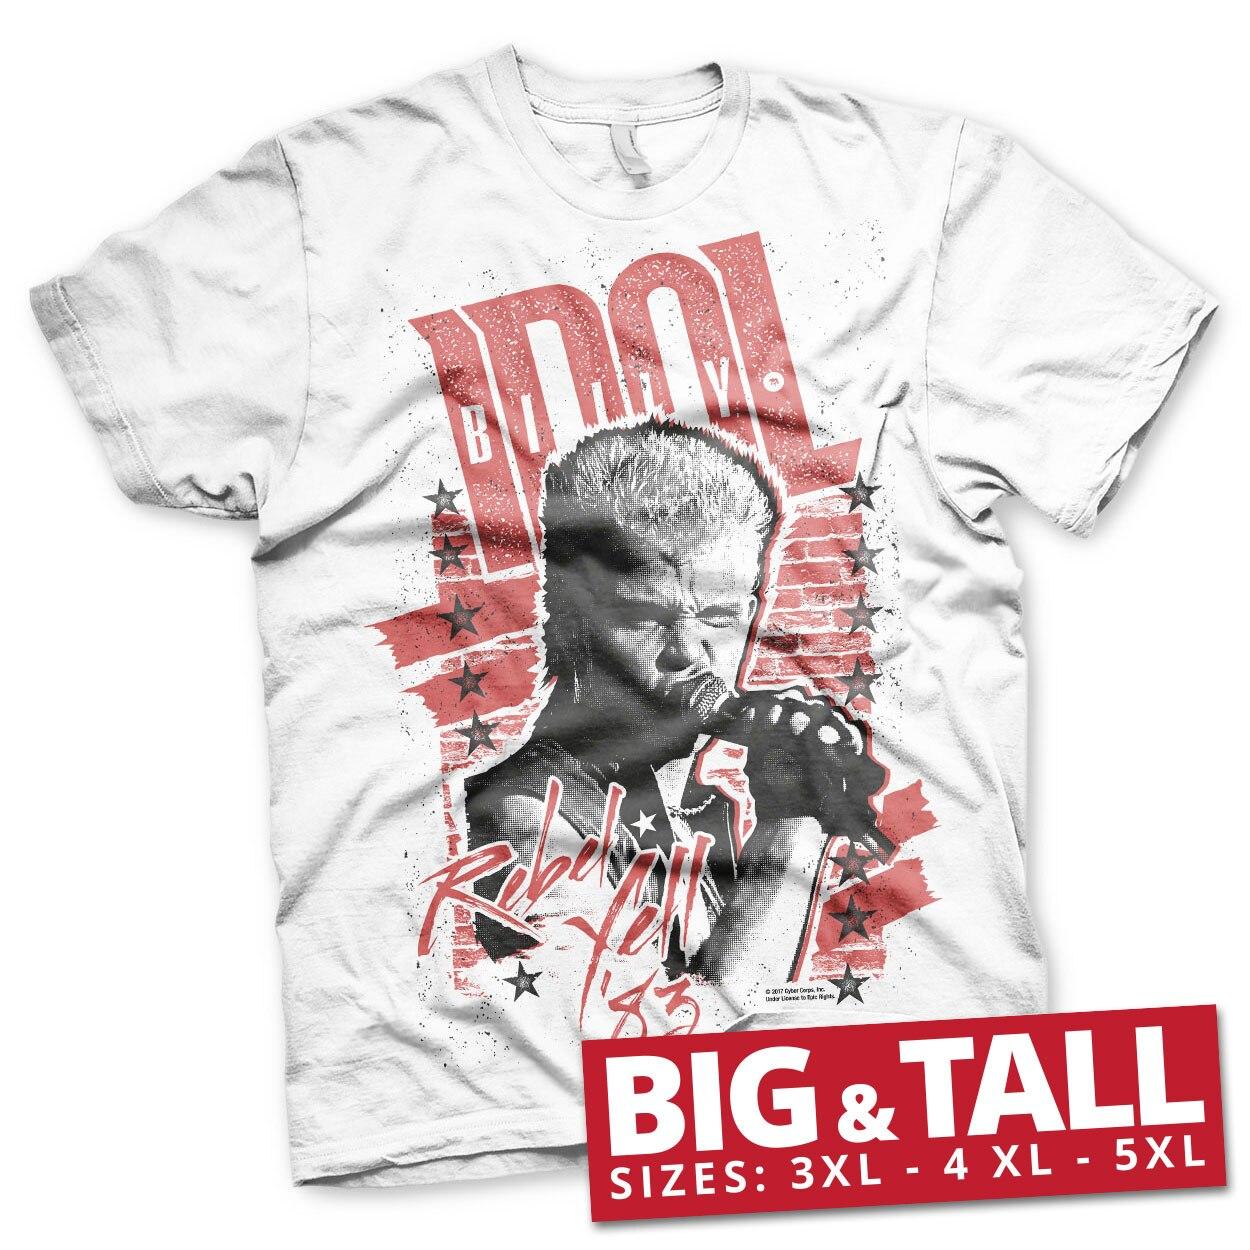 Billy Idol - Rebel Yell '83 Big & Tall T-Shirt